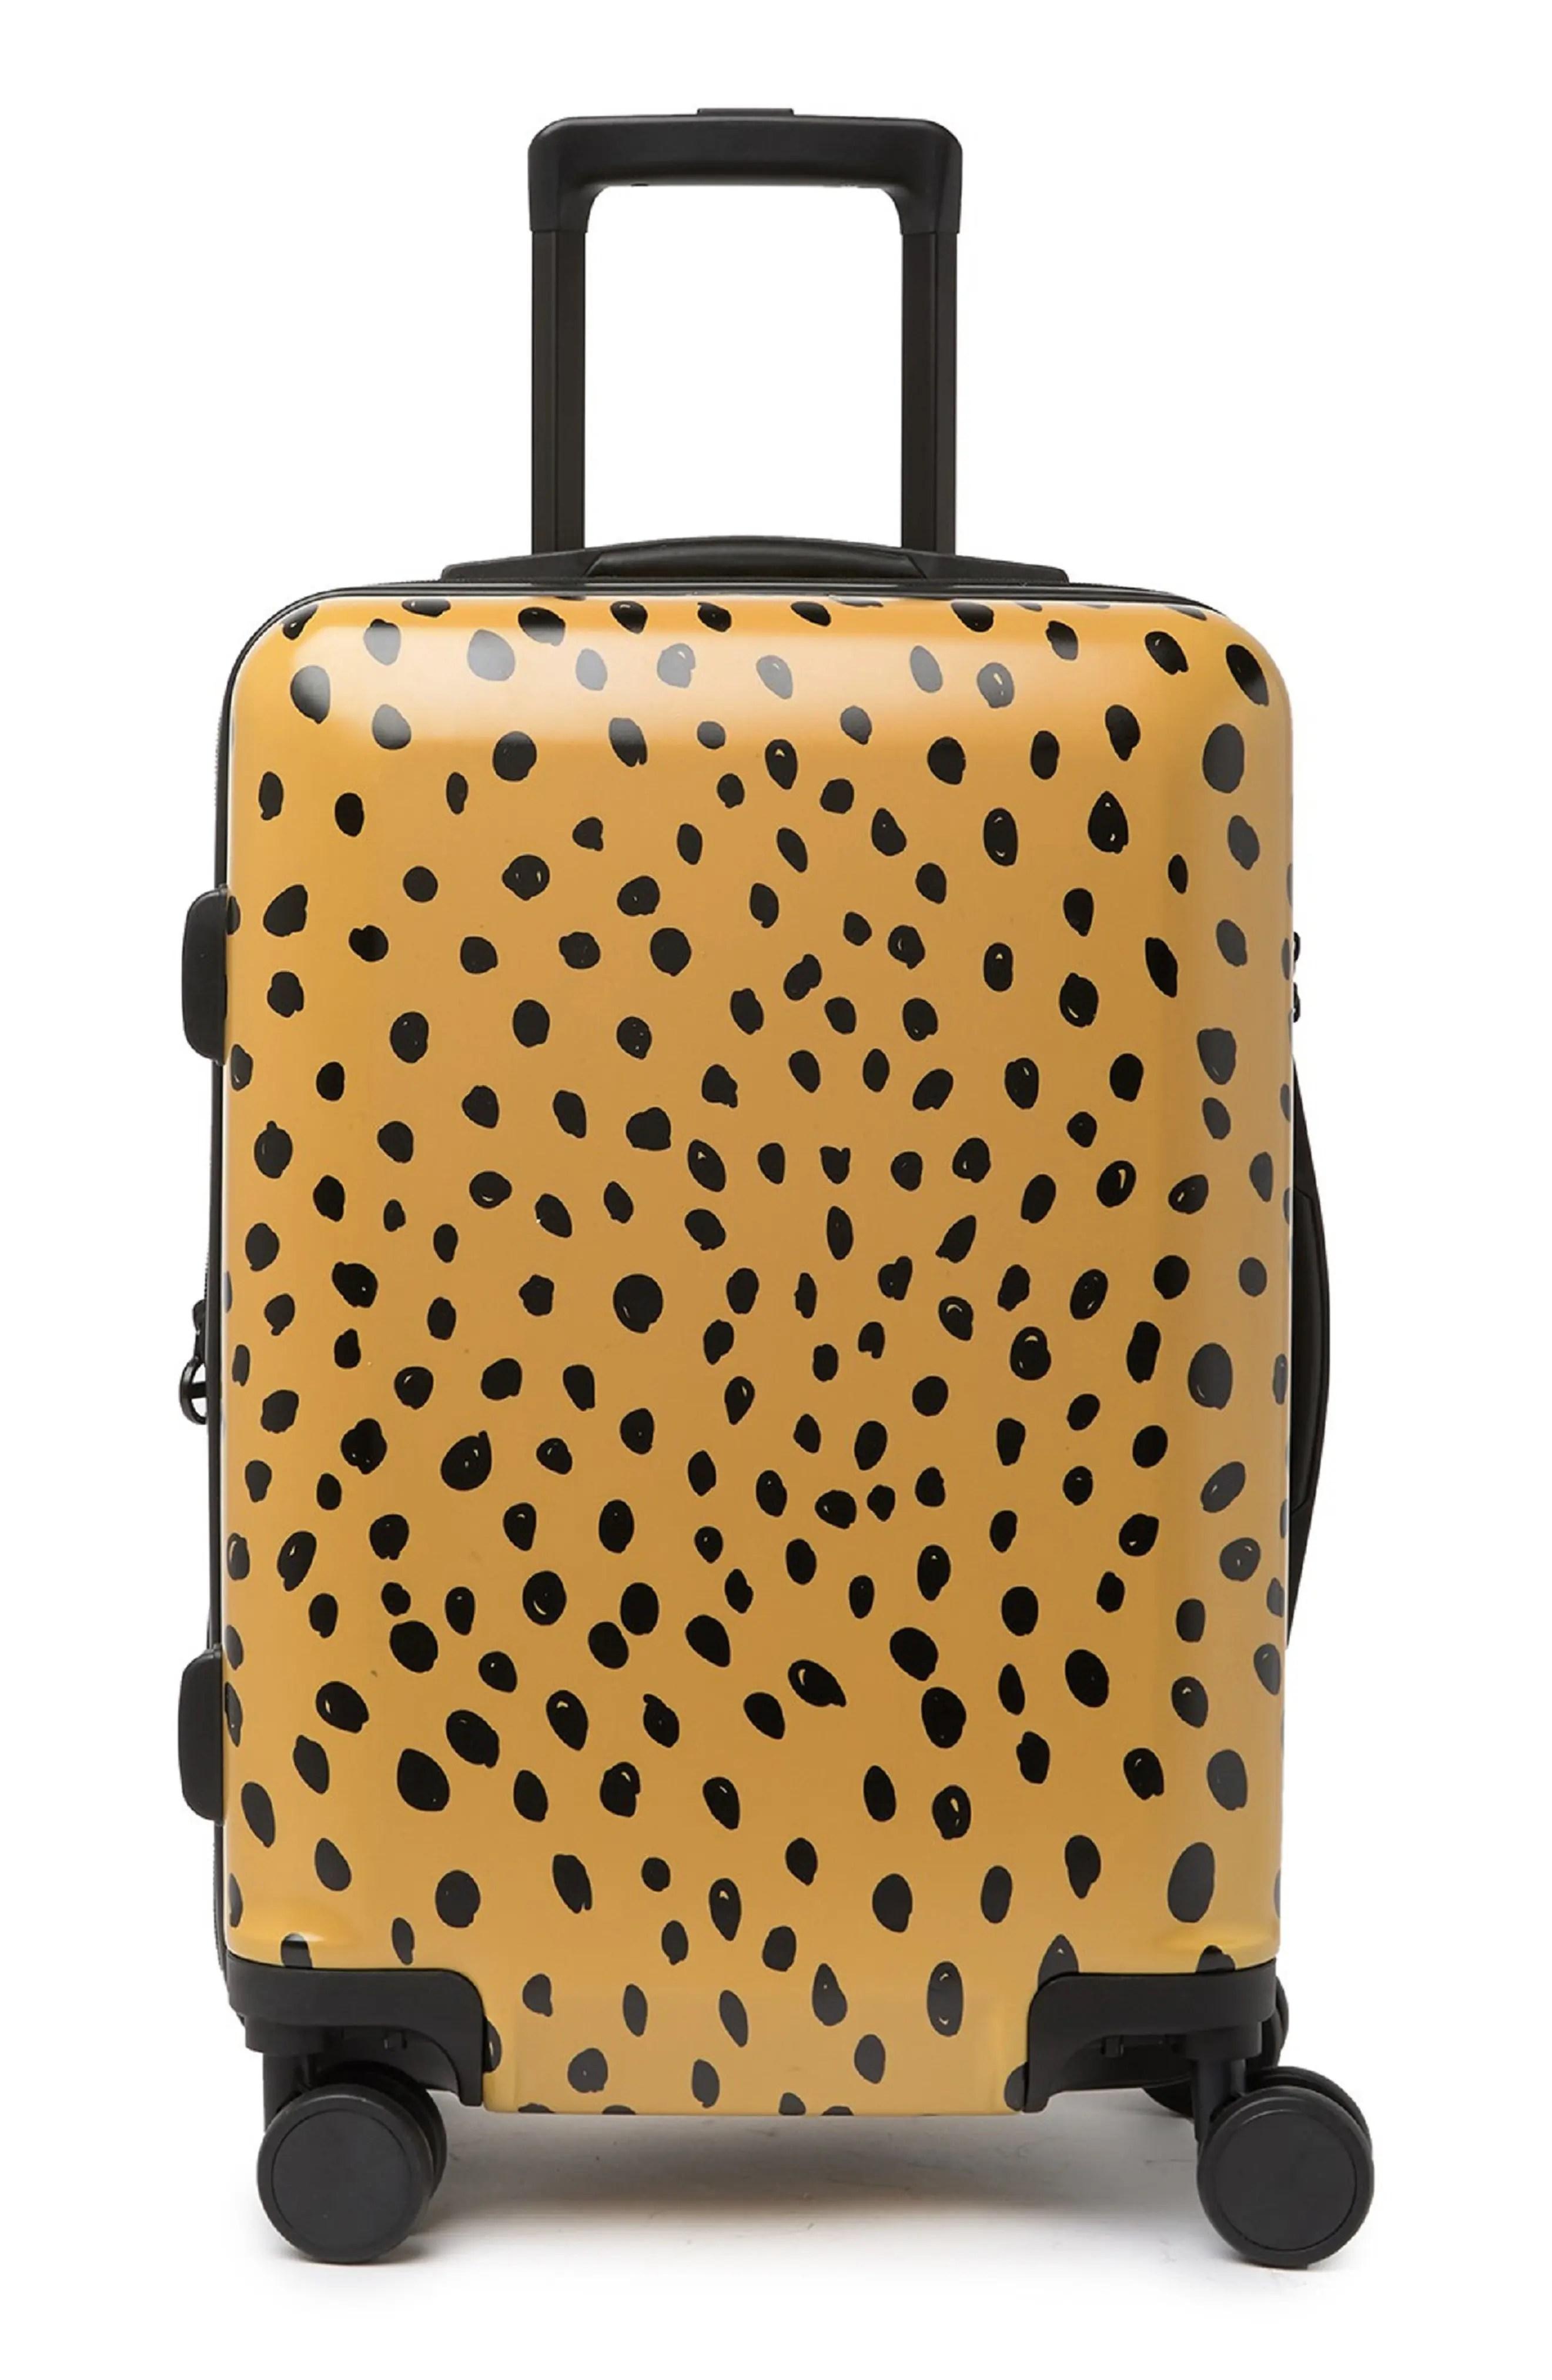 calpak luggage chipp 20 carry on